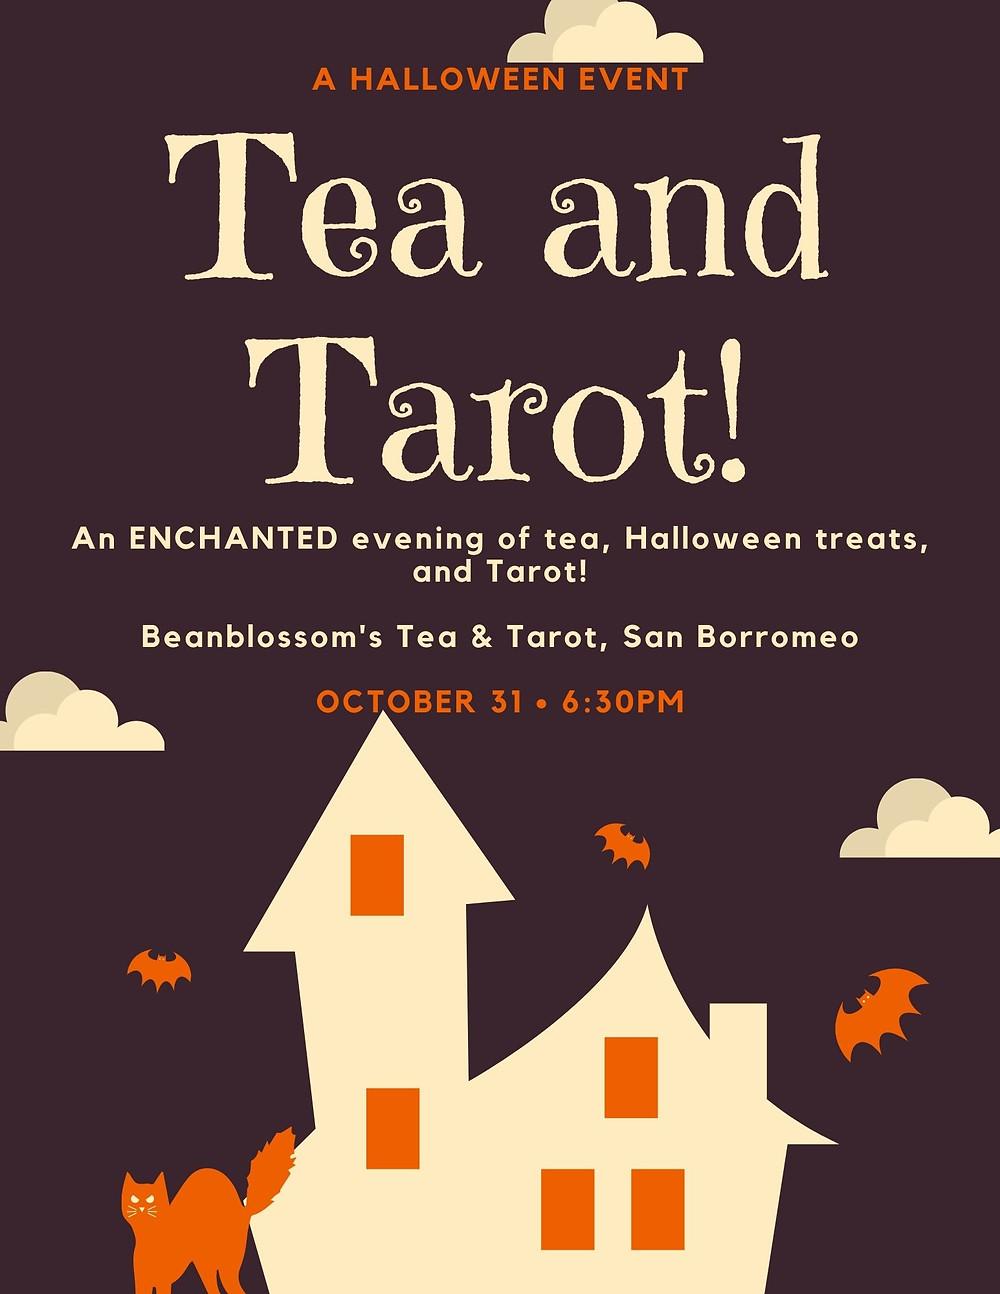 Flyer for Beanblossom's Tea and Tarot: A Halloween Event! An ENCHANTED evening of tea, Halloween treats, and Tarot!  Beanblossom's Tea & Tarot, San Borromeo  october 31 • 6:30pm